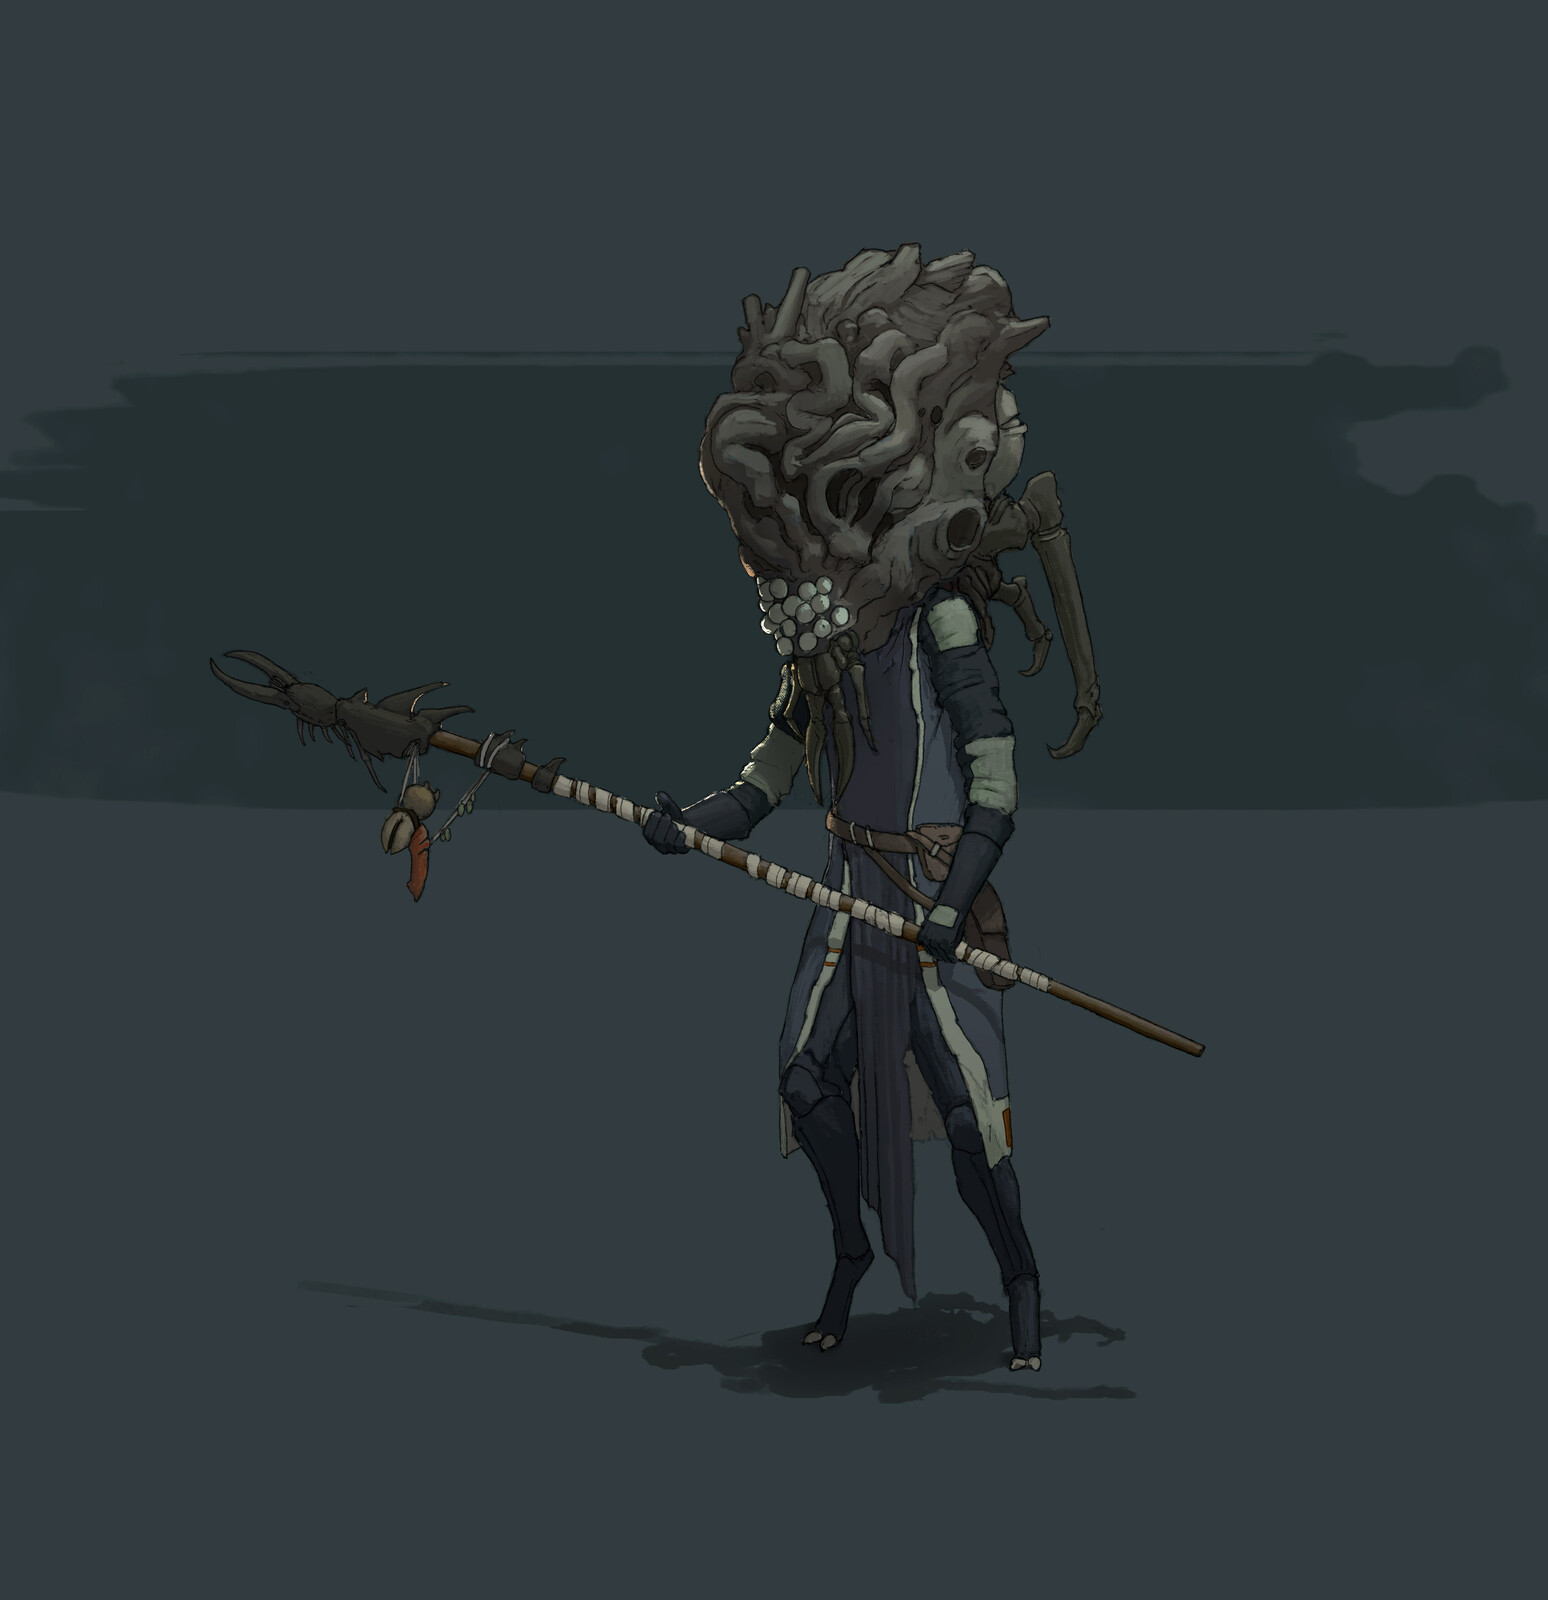 Remnant Swamp Creatures